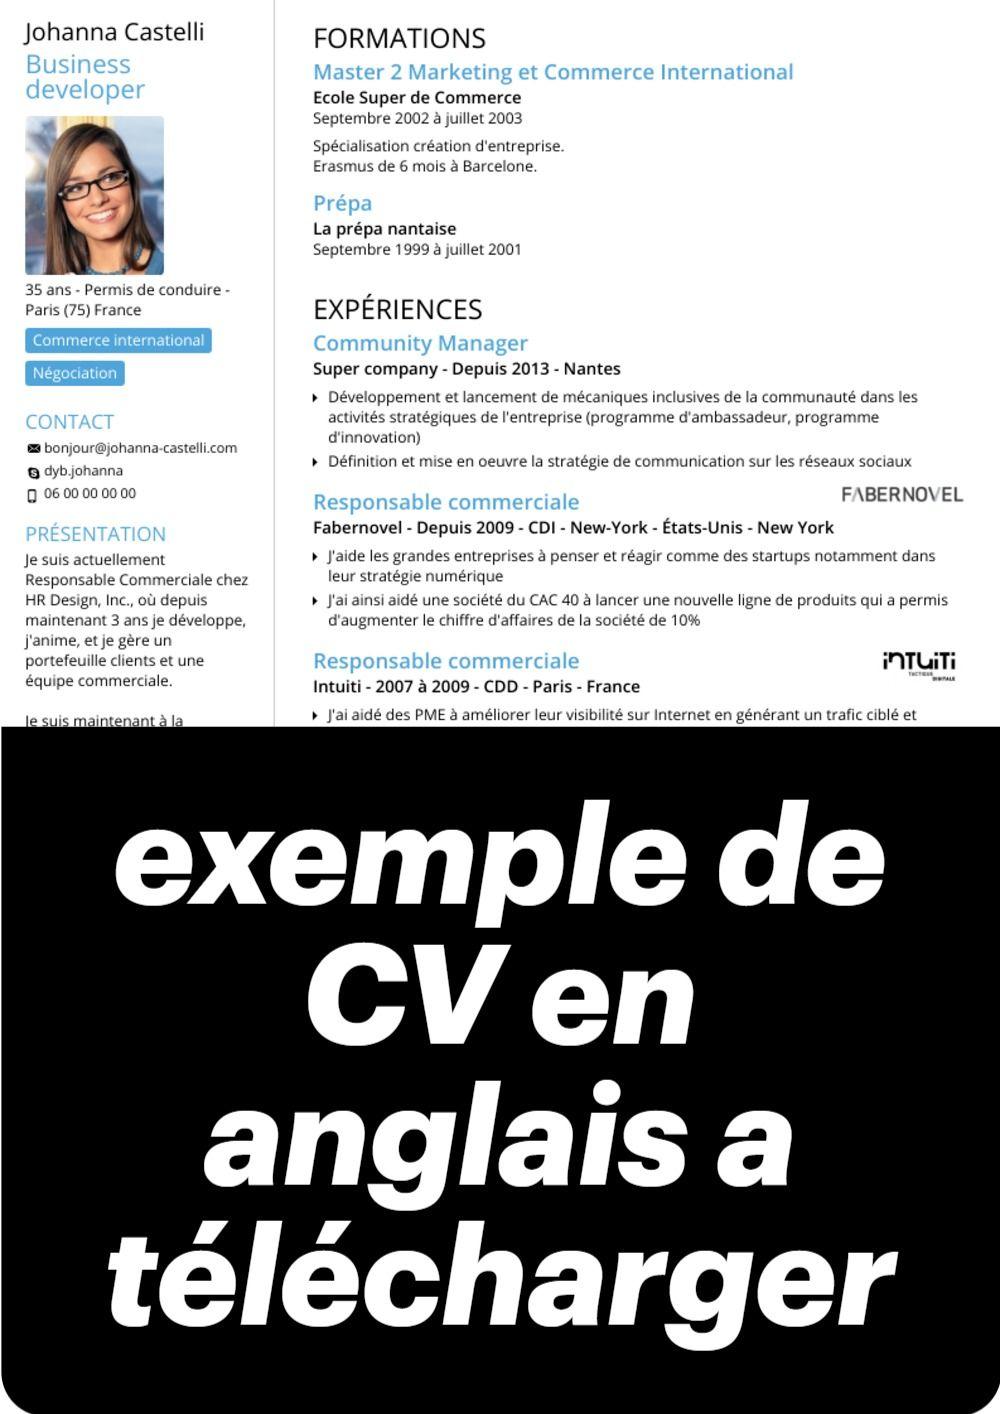 exemple de CV en anglais Word a télécharger exemple de CV